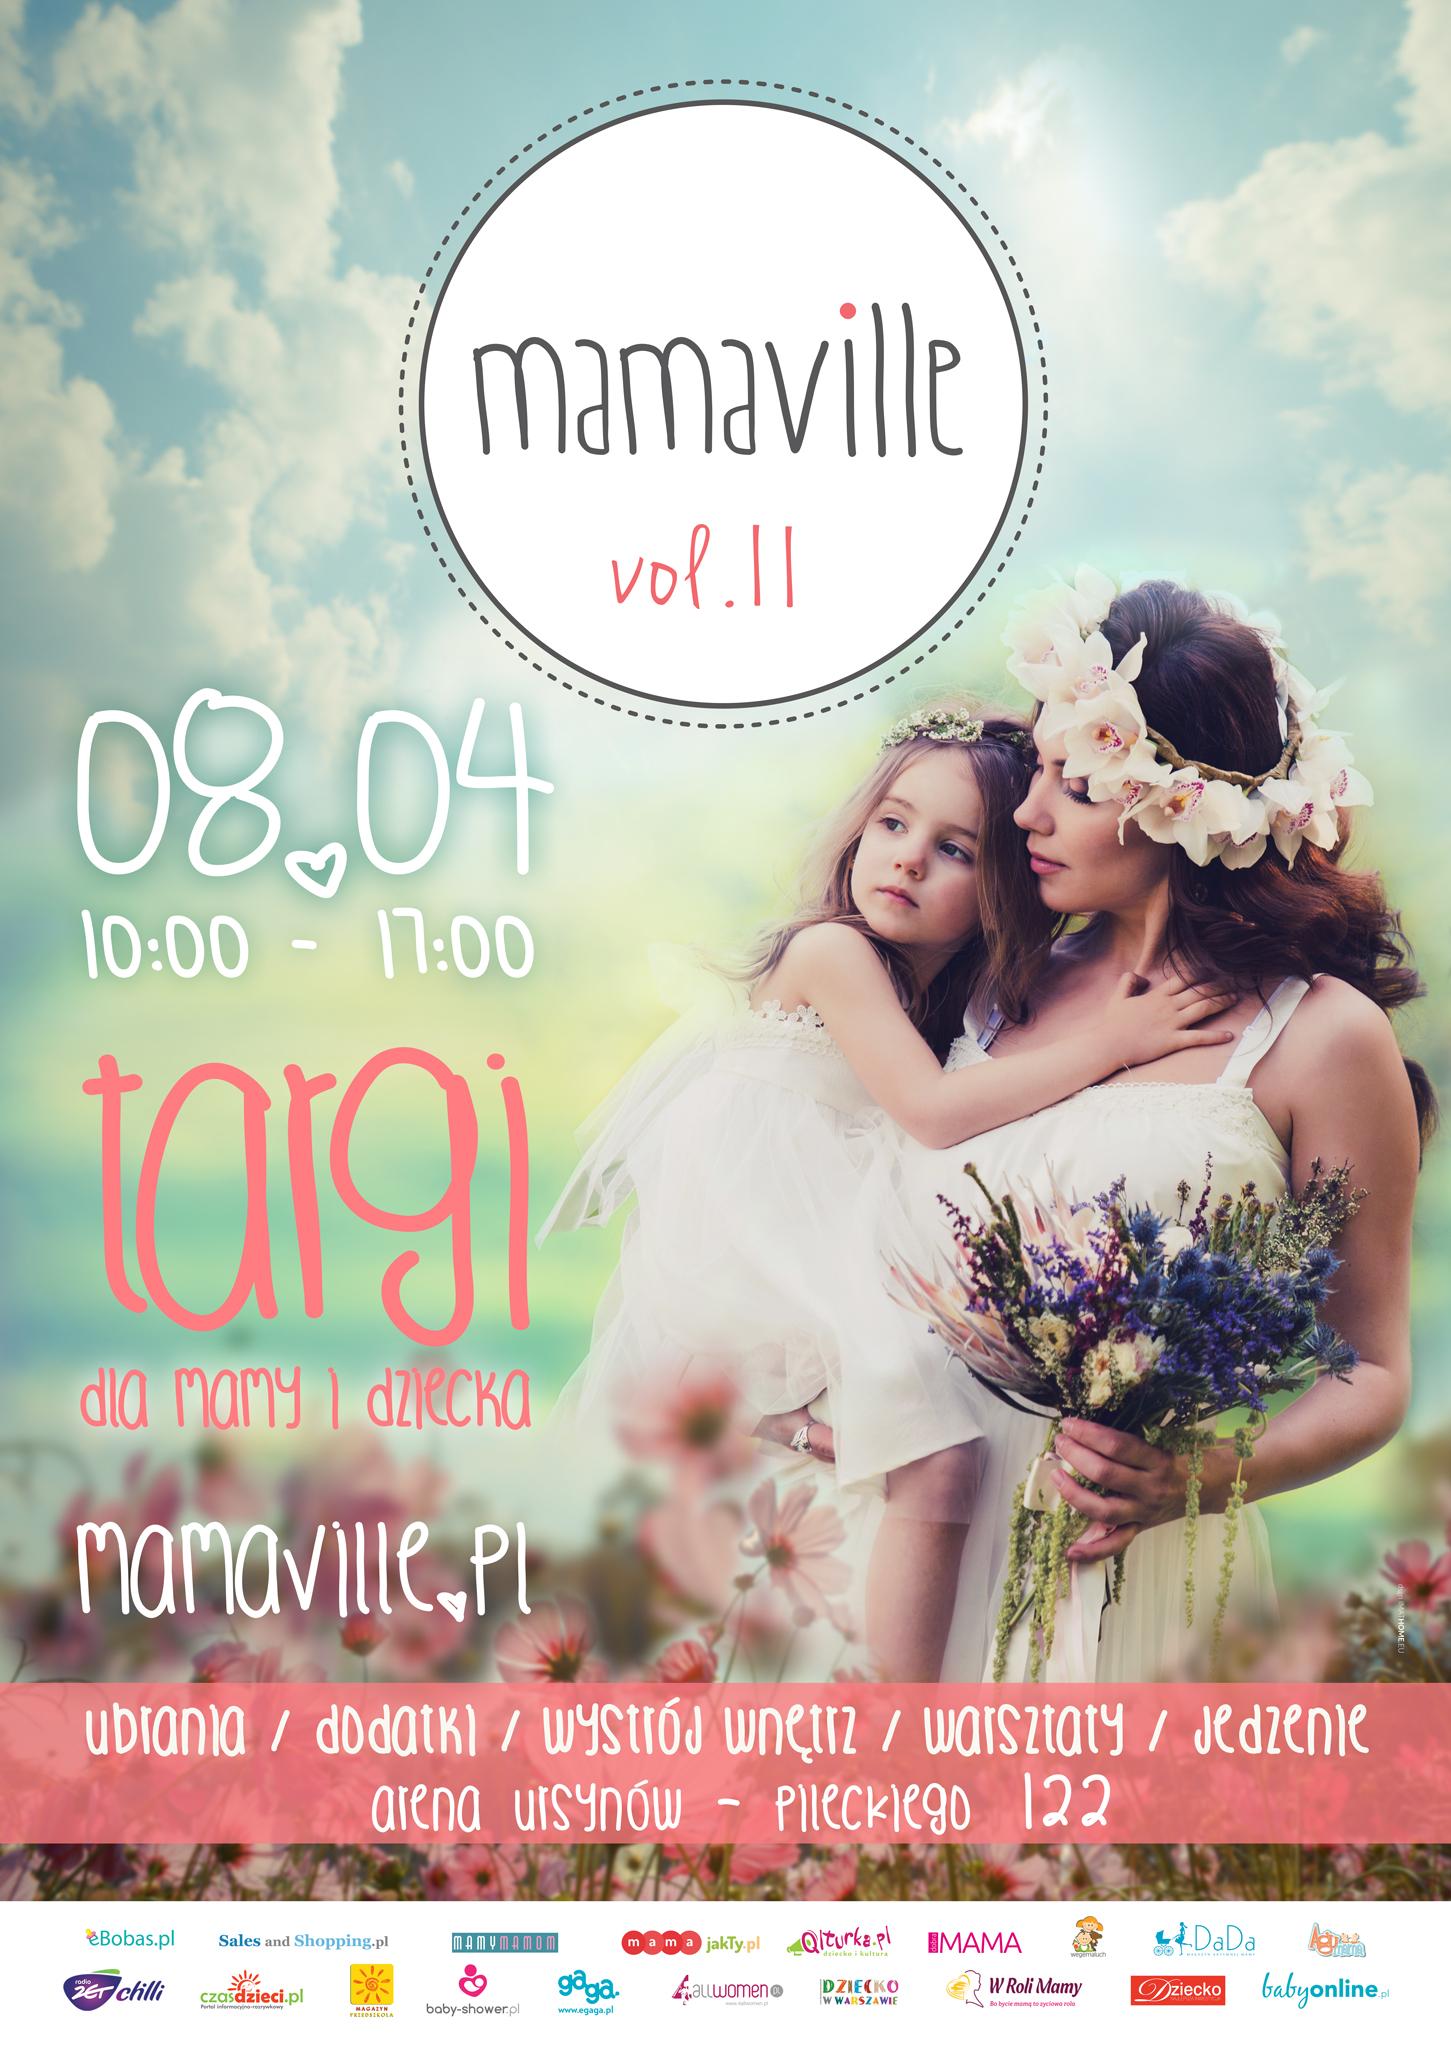 Targi Mamaville w Warszawie 8 kwietnia 2017